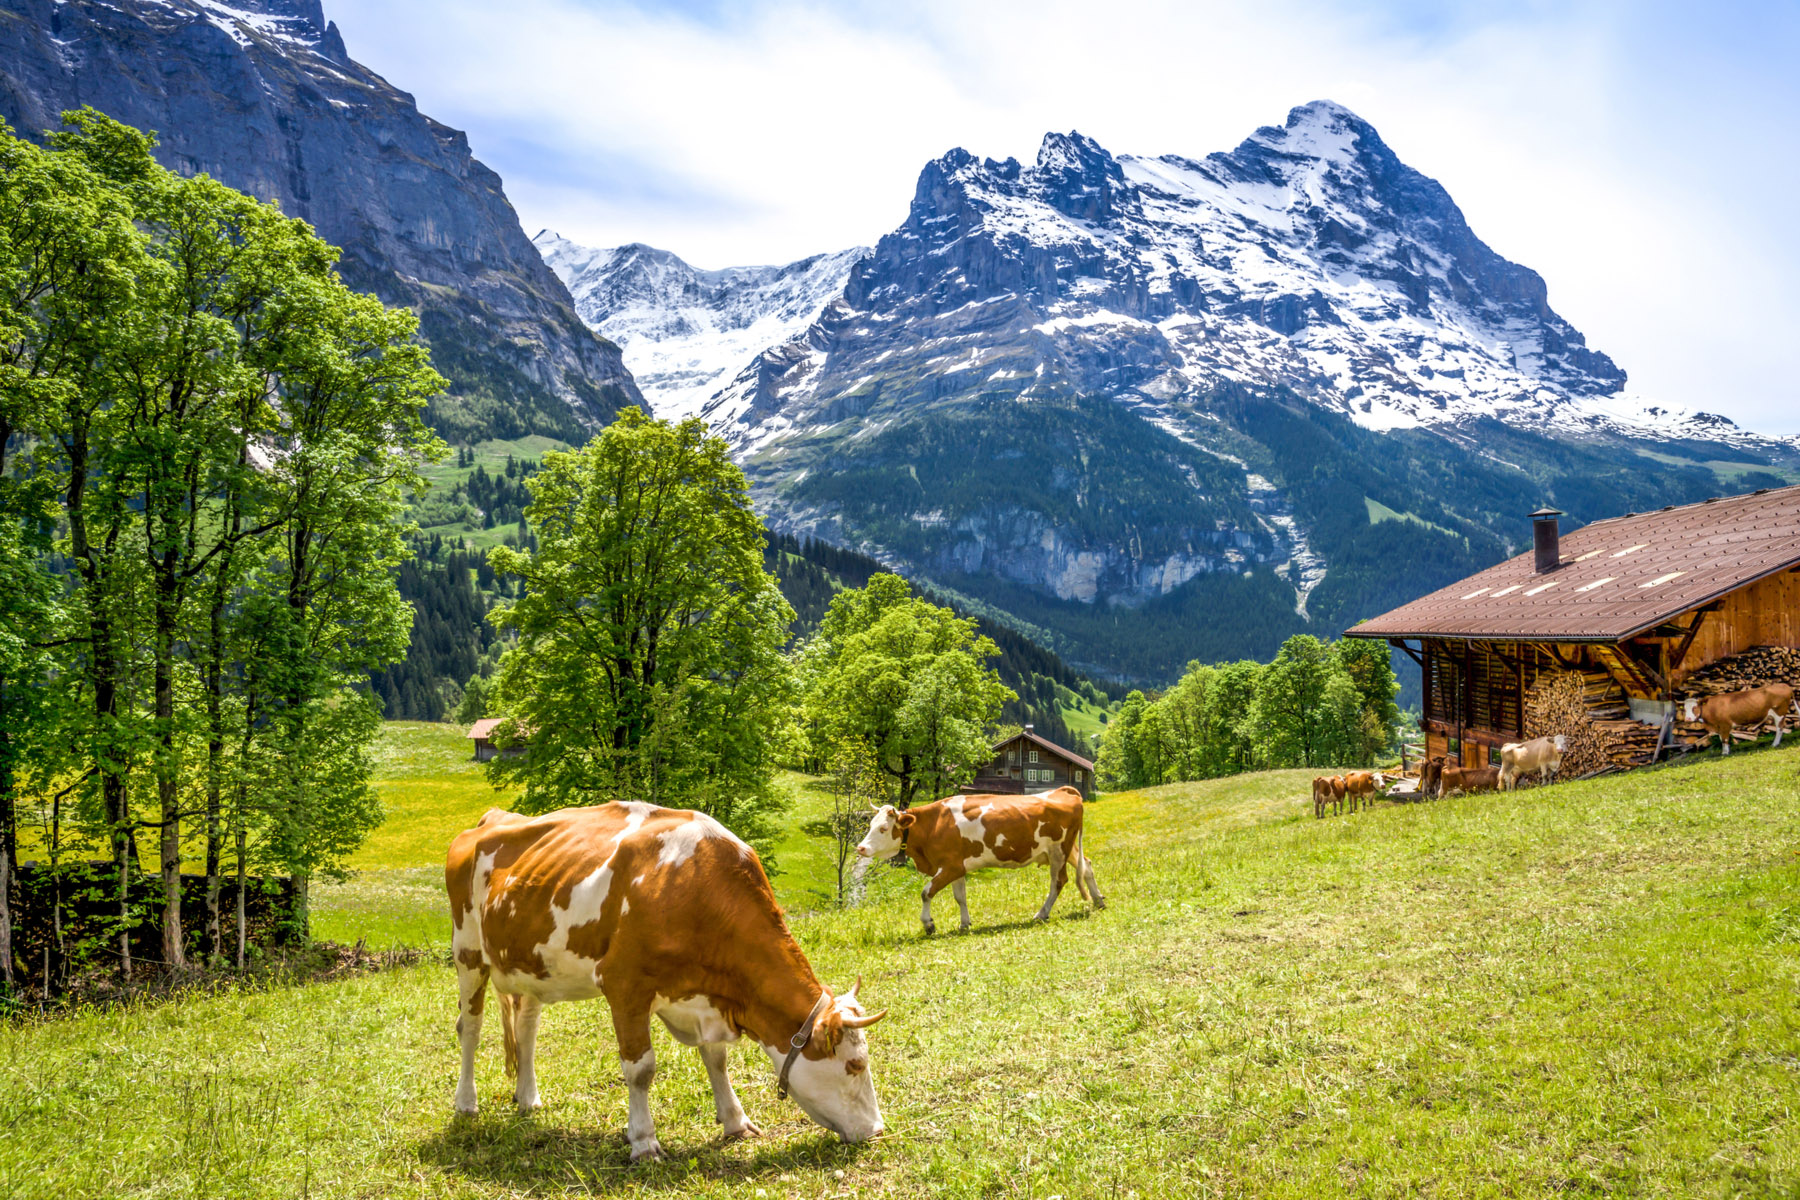 Dairy farm in Grindelwald